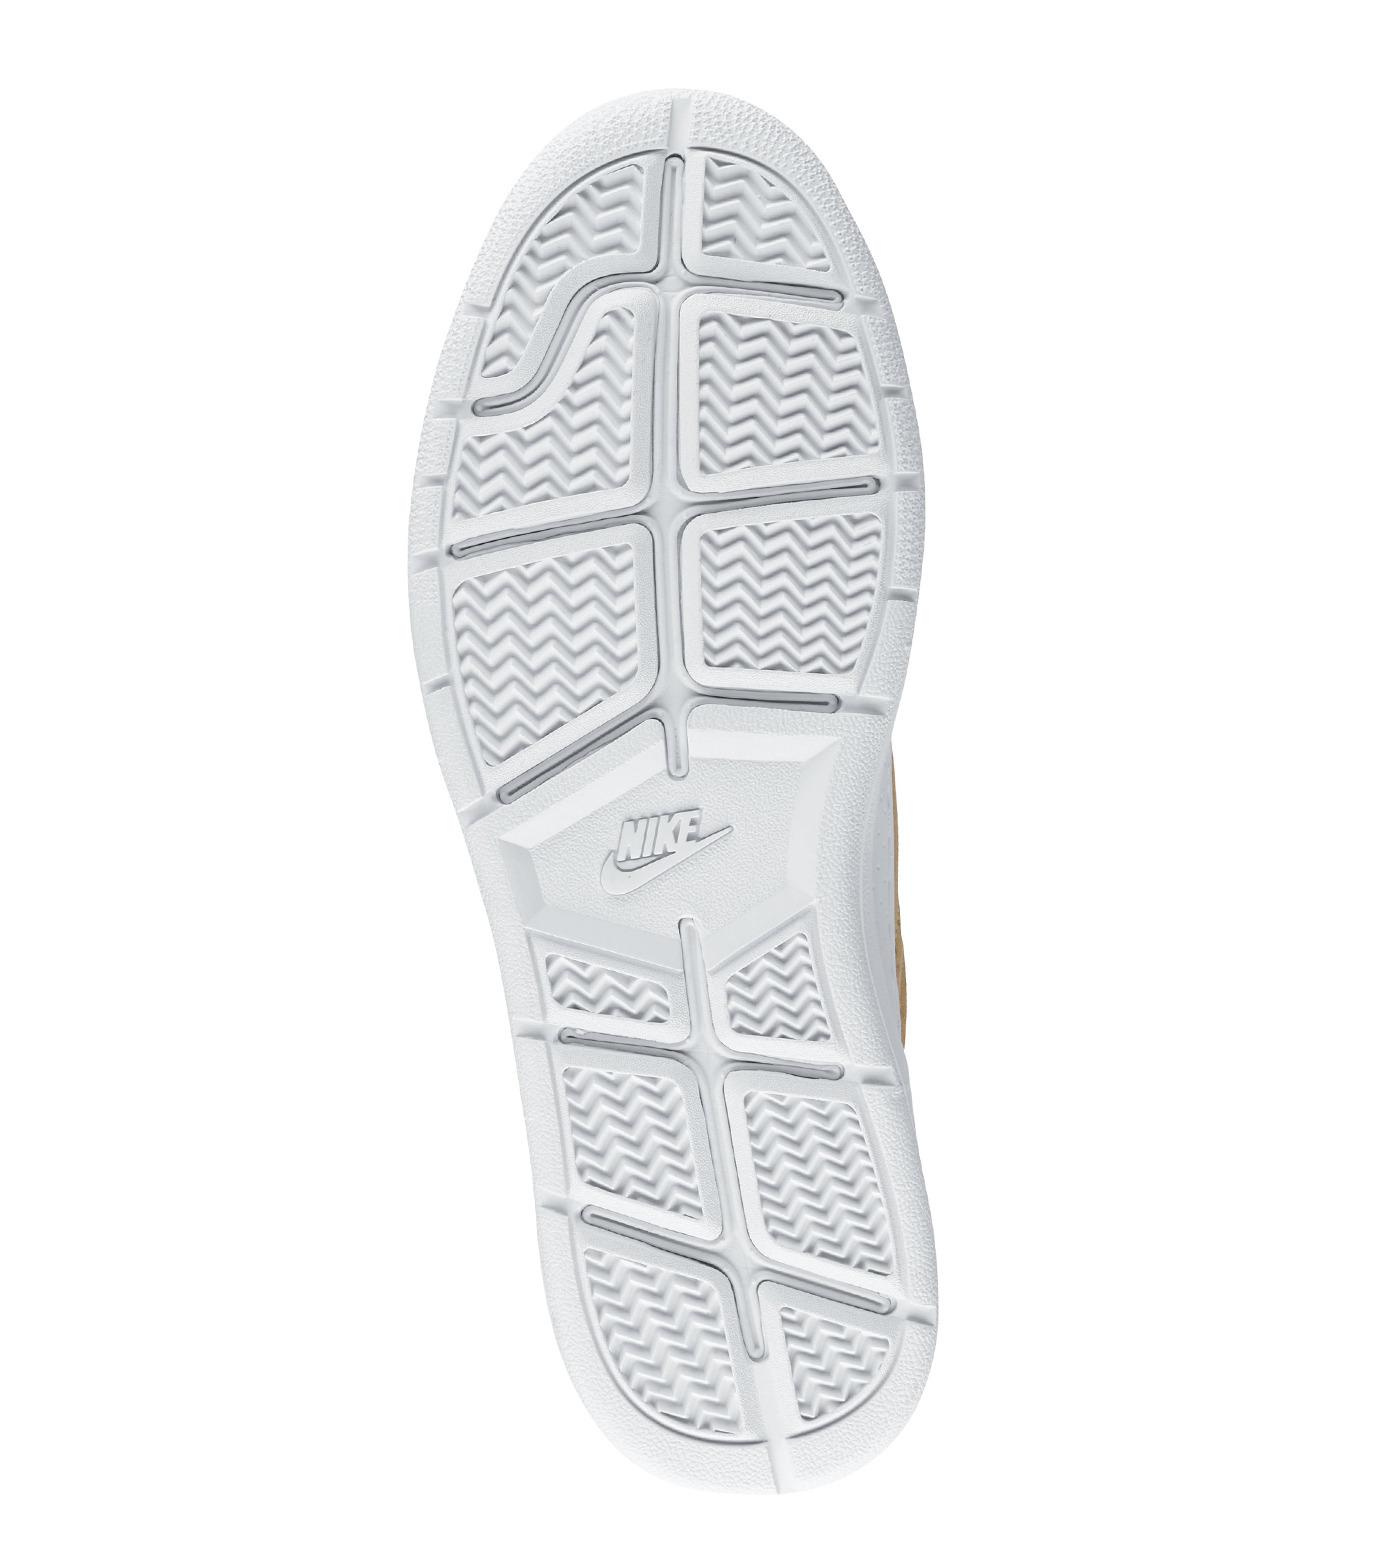 NIKE(ナイキ)のTENNIS CLASSIC PDM-WHITE(シューズ/shoes)-621357-227-5 拡大詳細画像2